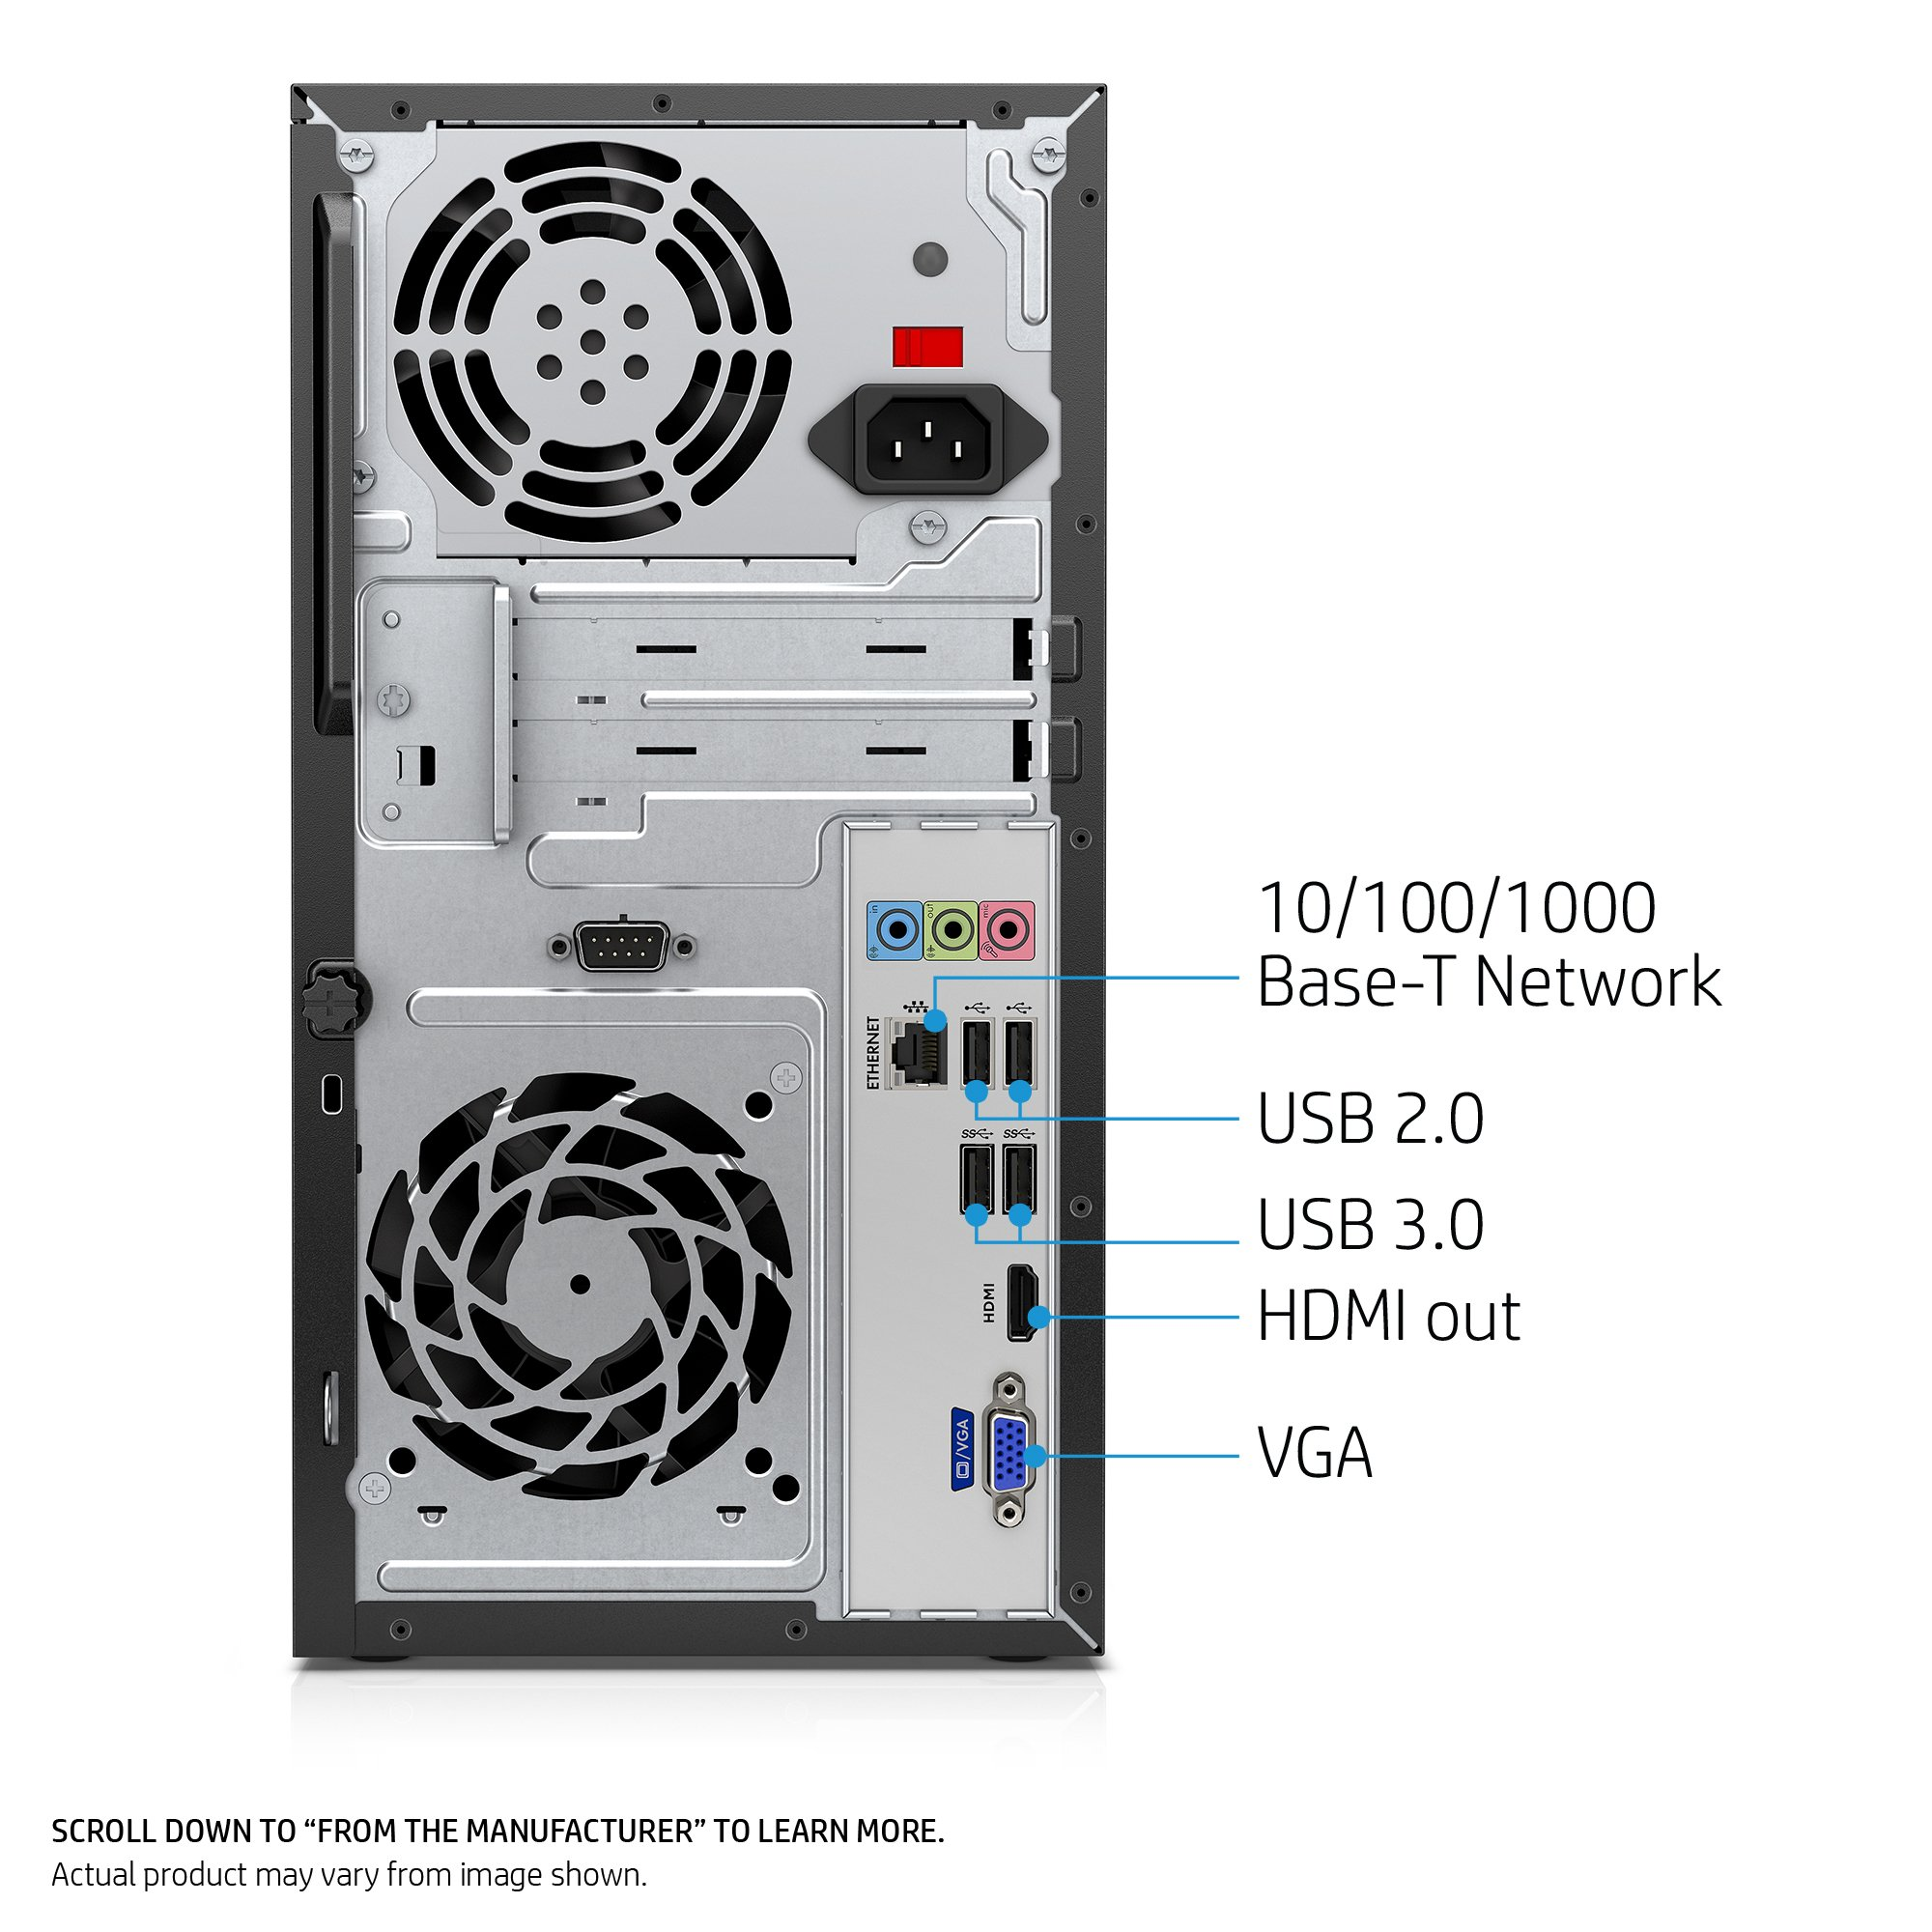 HP Pavilion Desktop Computer, Intel Core i7-7700, 12GB RAM, 1TB hard drive, Windows 10 (570-p030, Black) by HP (Image #2)